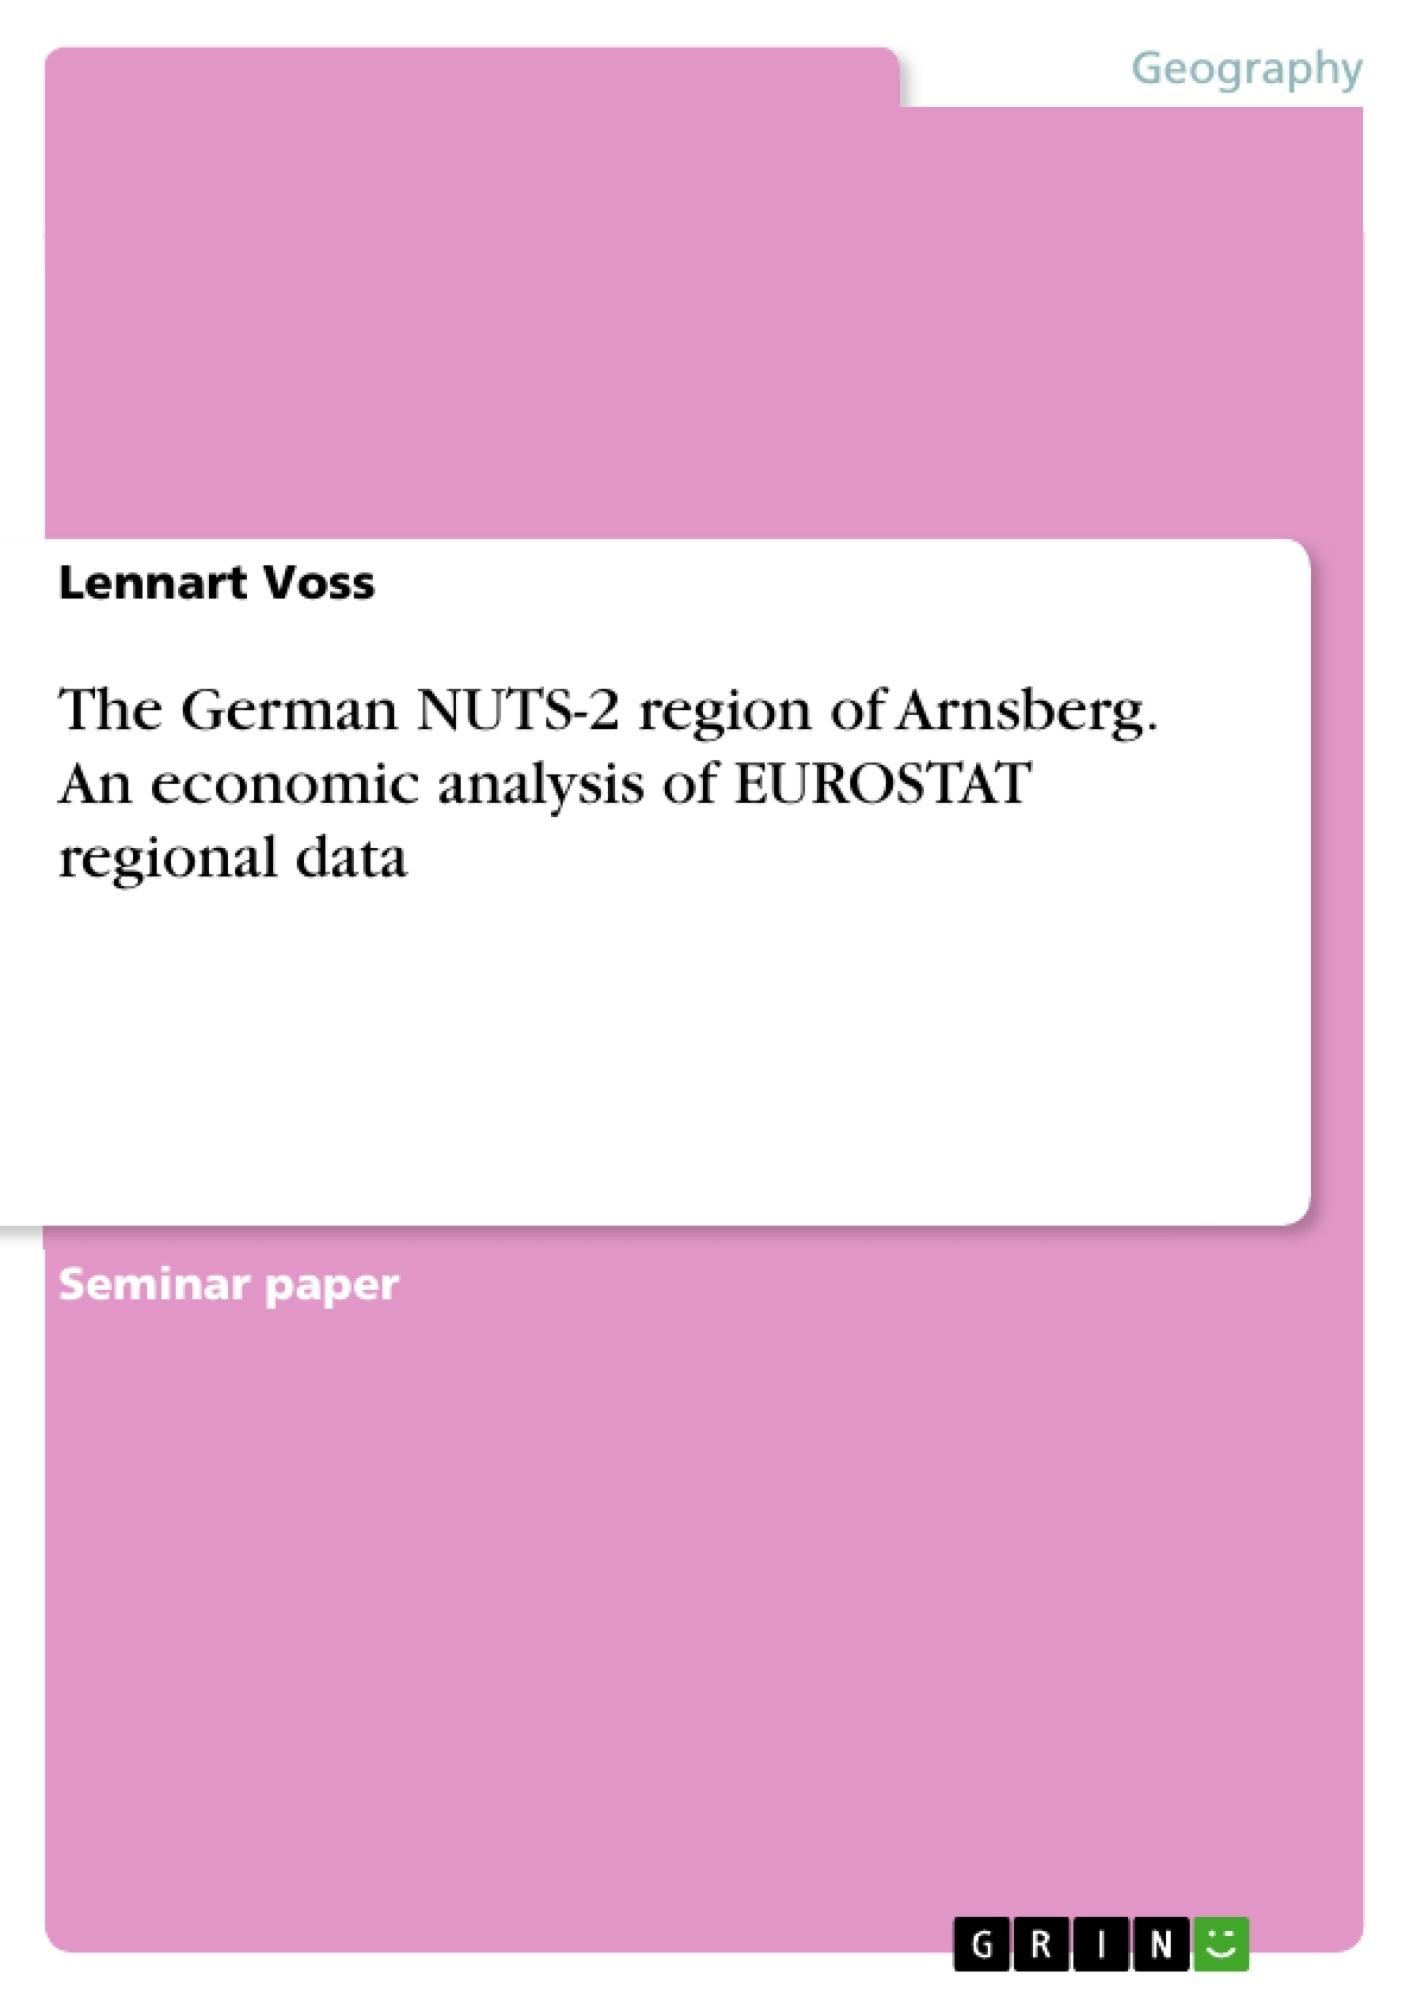 Title: The German NUTS-2 region of Arnsberg. An economic analysis of EUROSTAT regional data